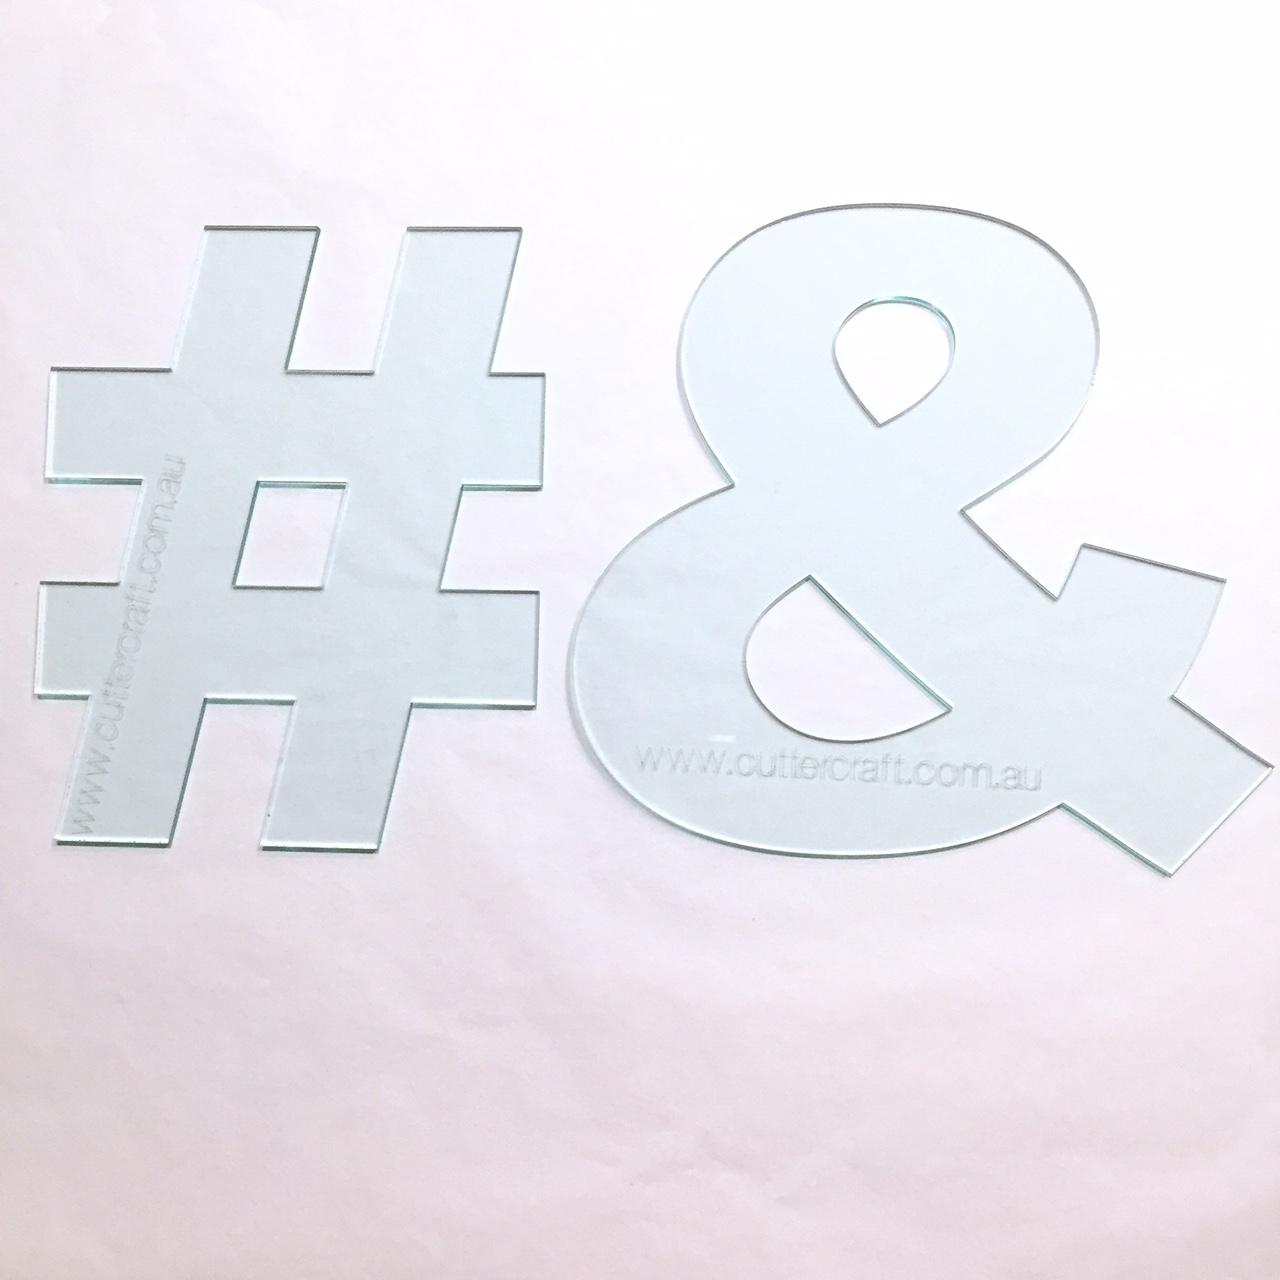 20cm high wide  u0026 symbol ampersand templates